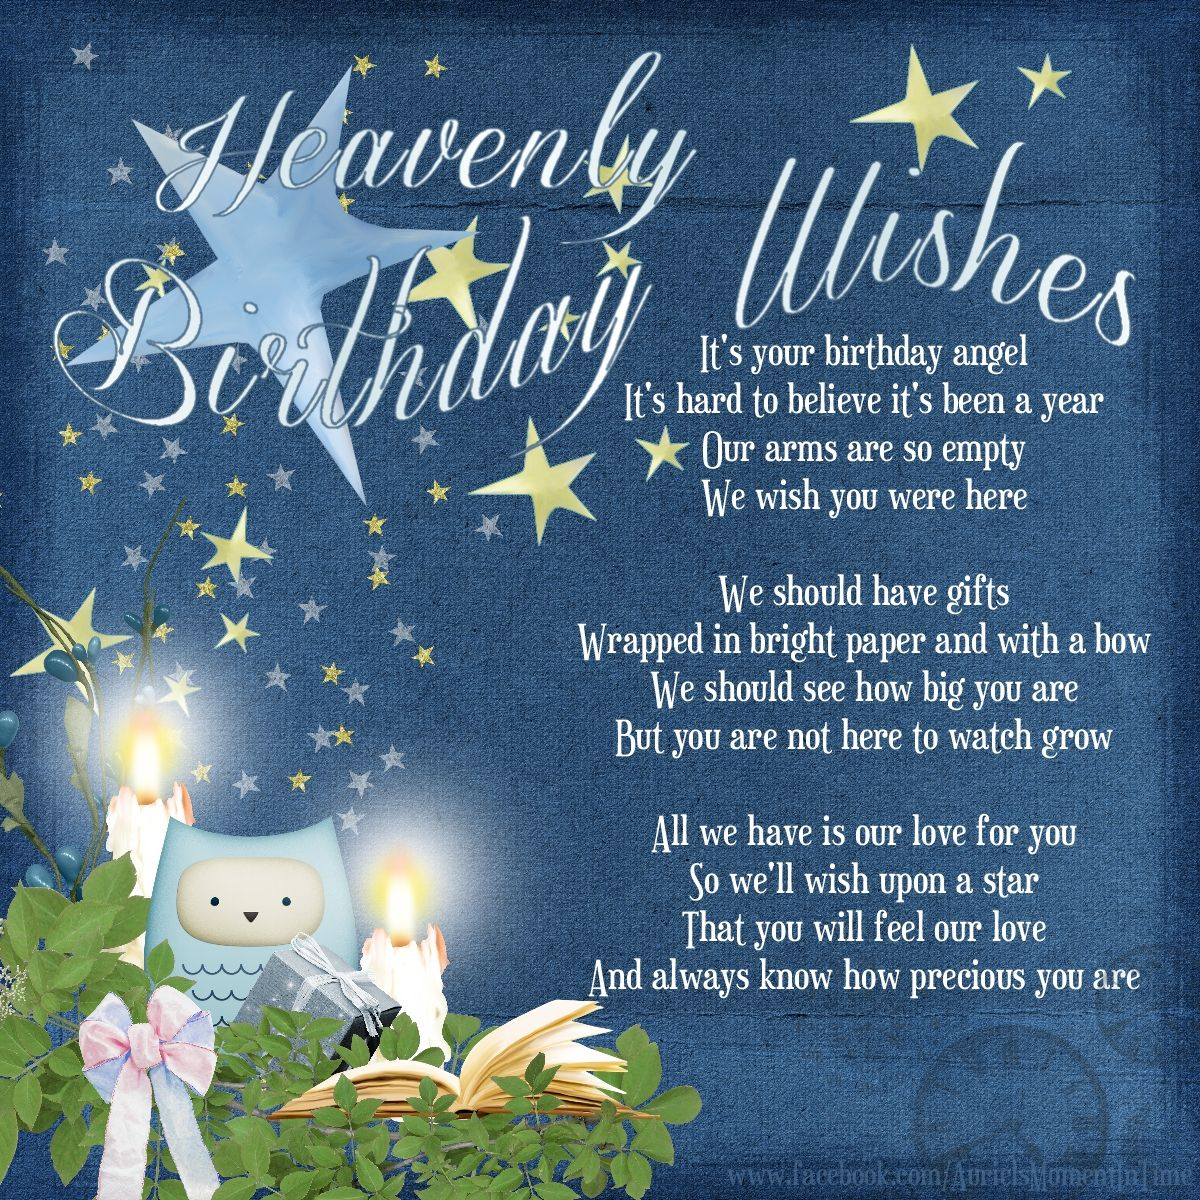 Heavenly Birthday Wishes